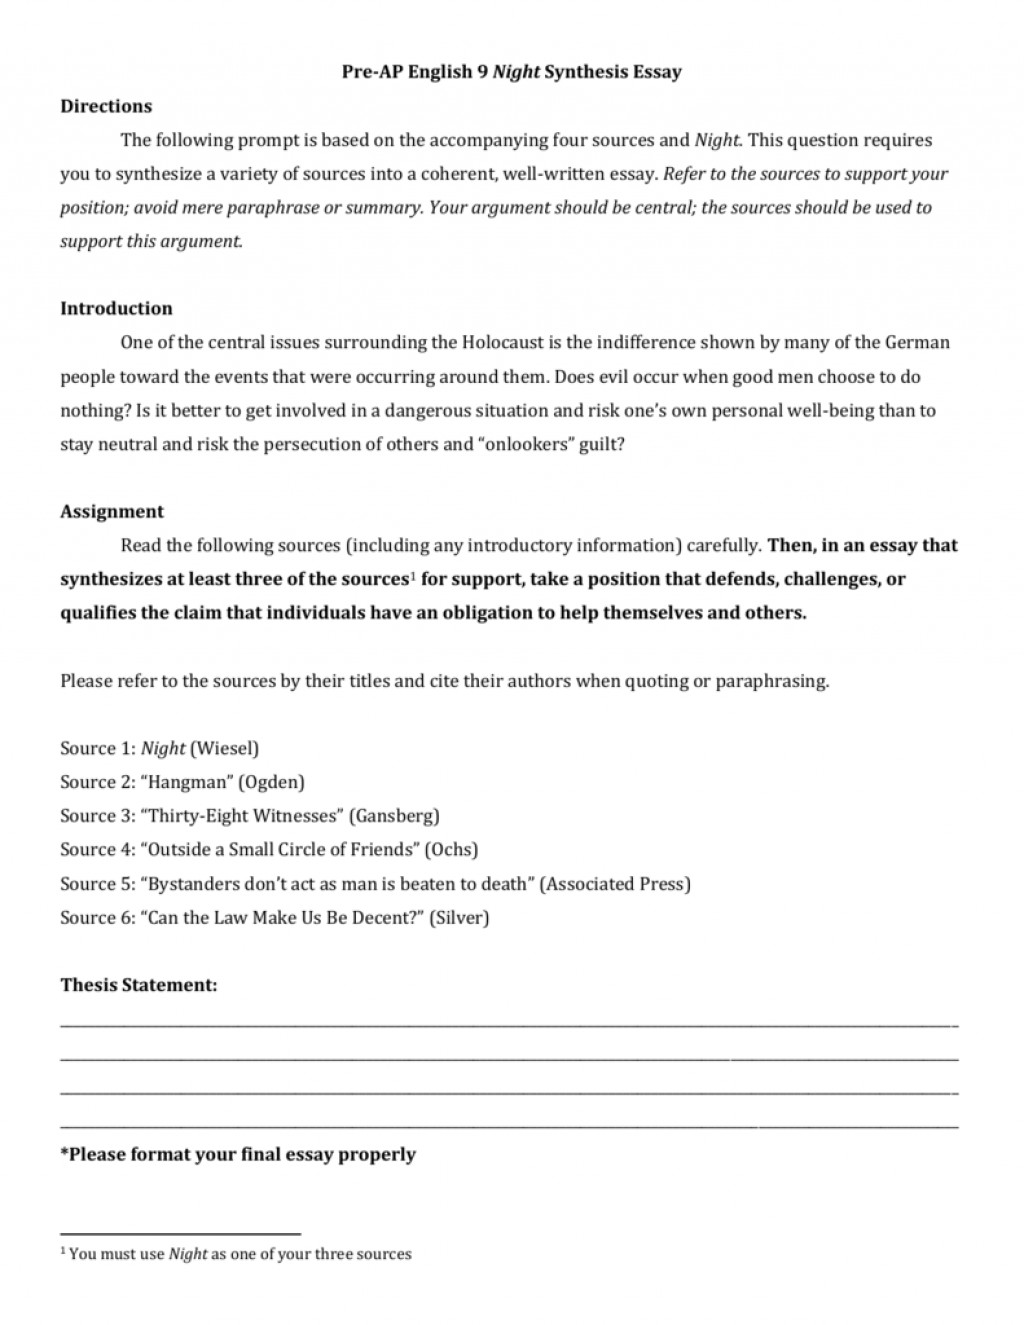 003 006963363 1 Synthesis Essay Sensational Outline Format Ap Lang Large